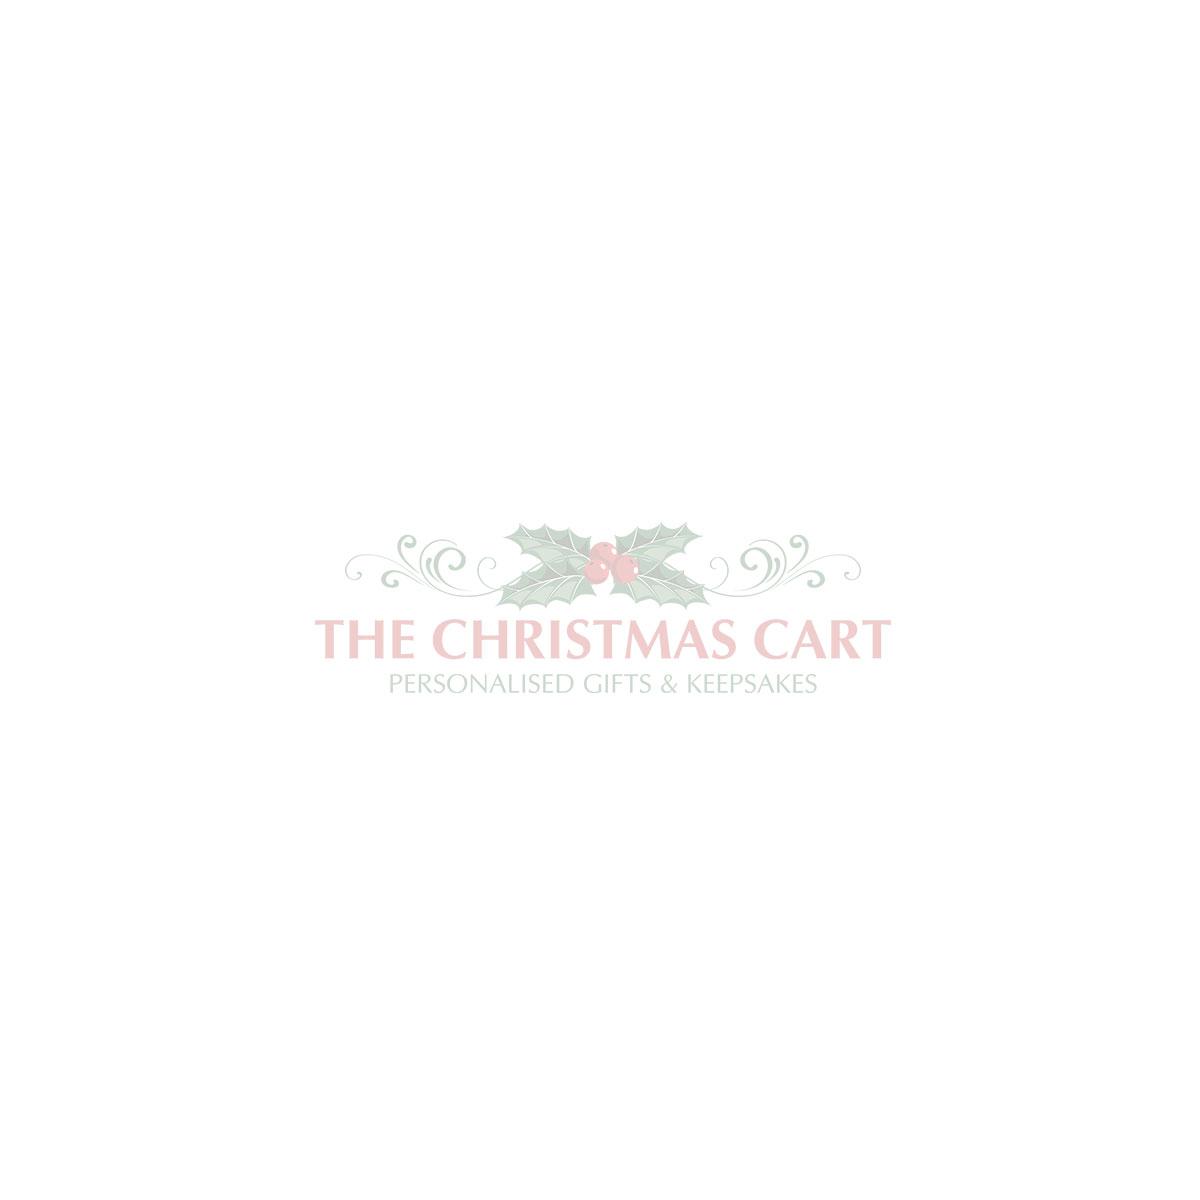 Merry Christmas by Mariah Carey